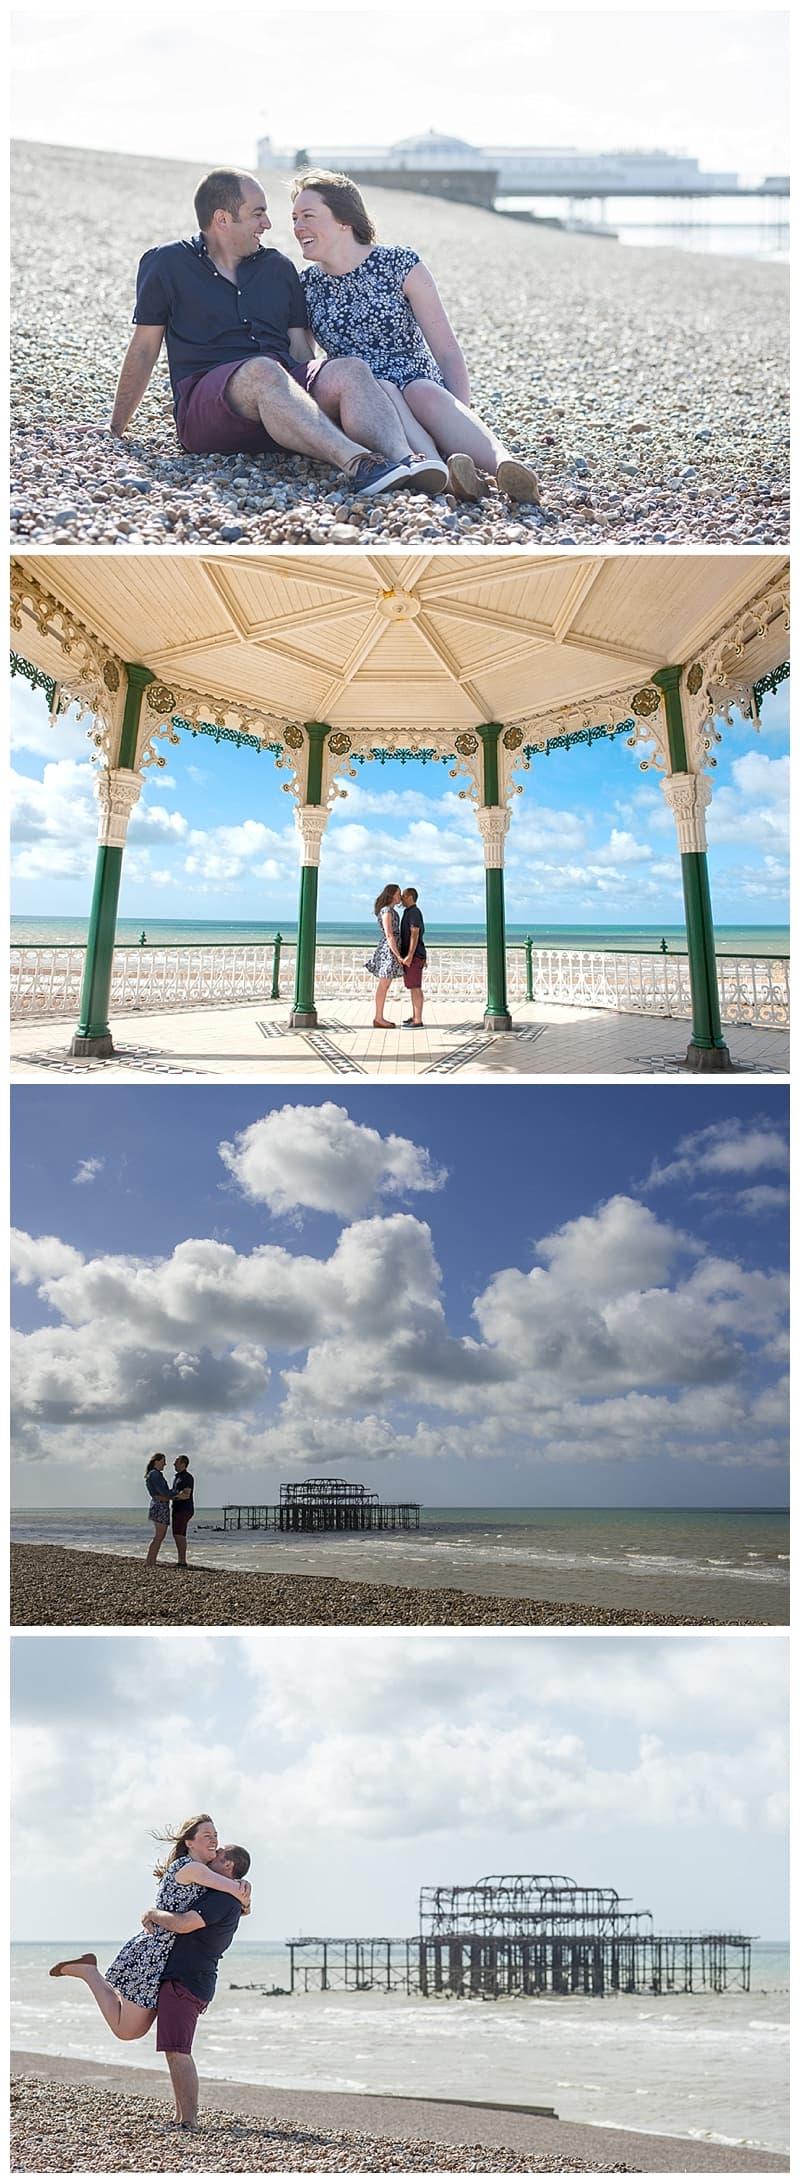 Becca&Fil, Brighton Engagement Photoshoot, Benjamin Wetherall Photography0003.jpg